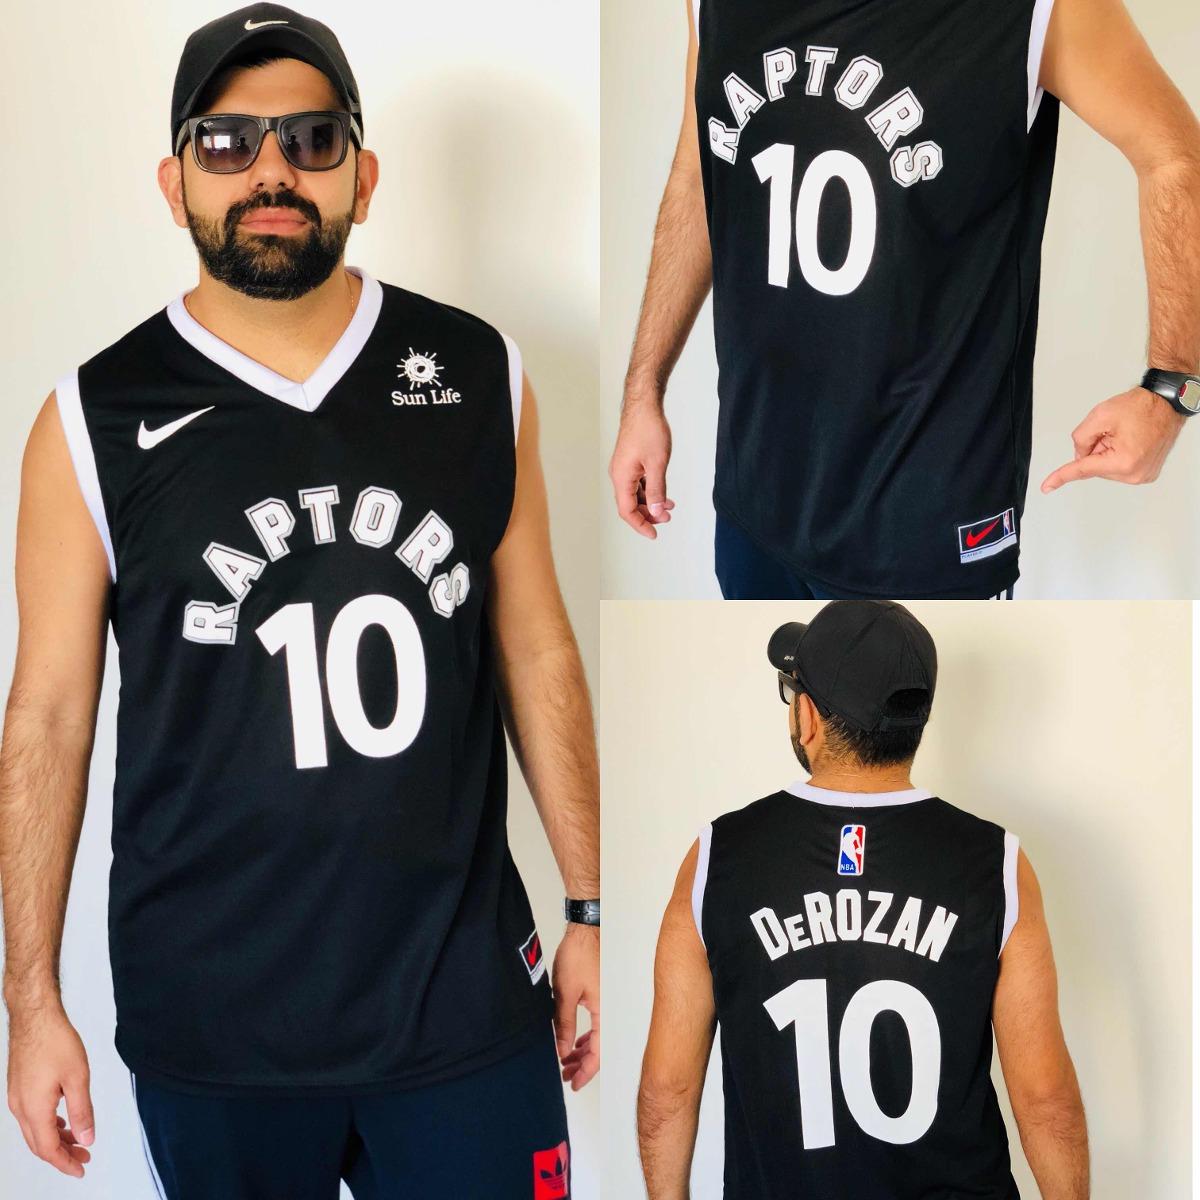 639a470158 kit 5 camiseta regata basquete nba revenda atacado dri fit. Carregando zoom.